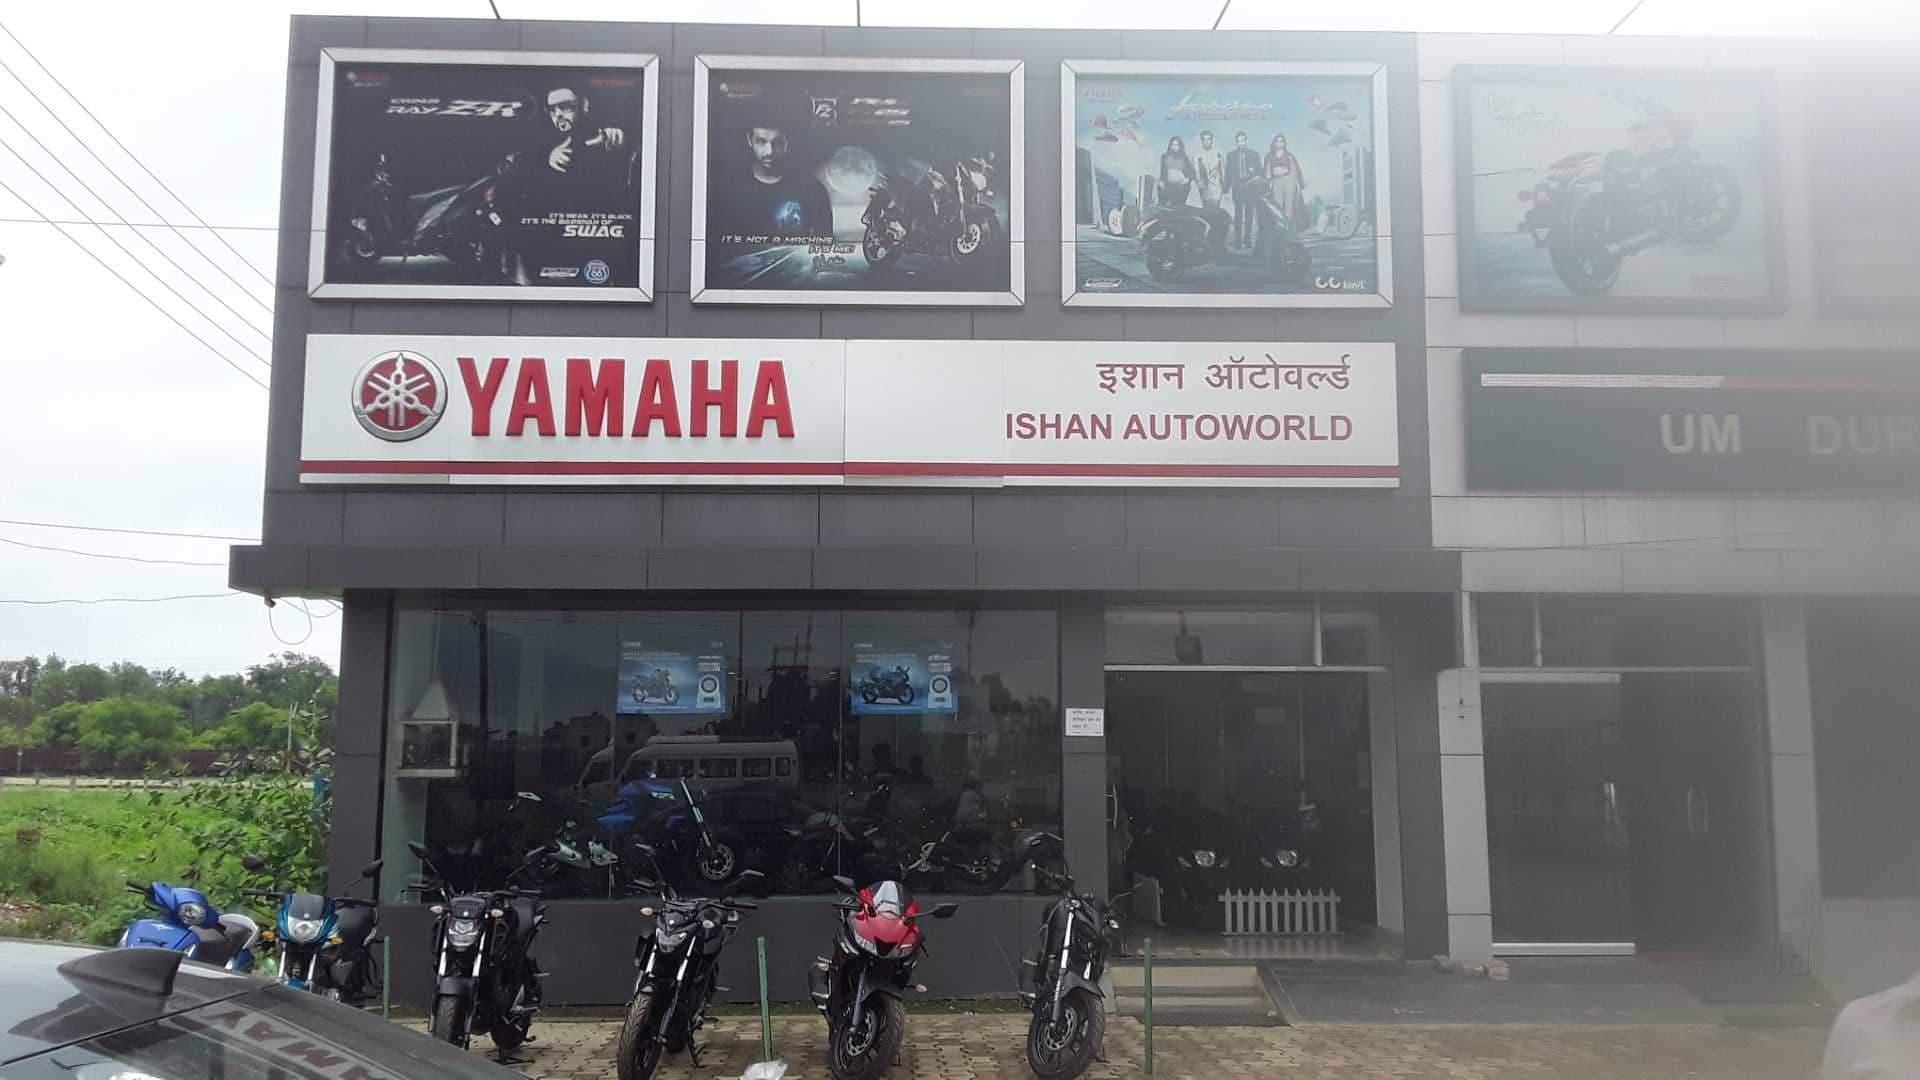 Top Yamaha Motorcycle Showrooms in Durg - Yamaha Bikes - Justdial